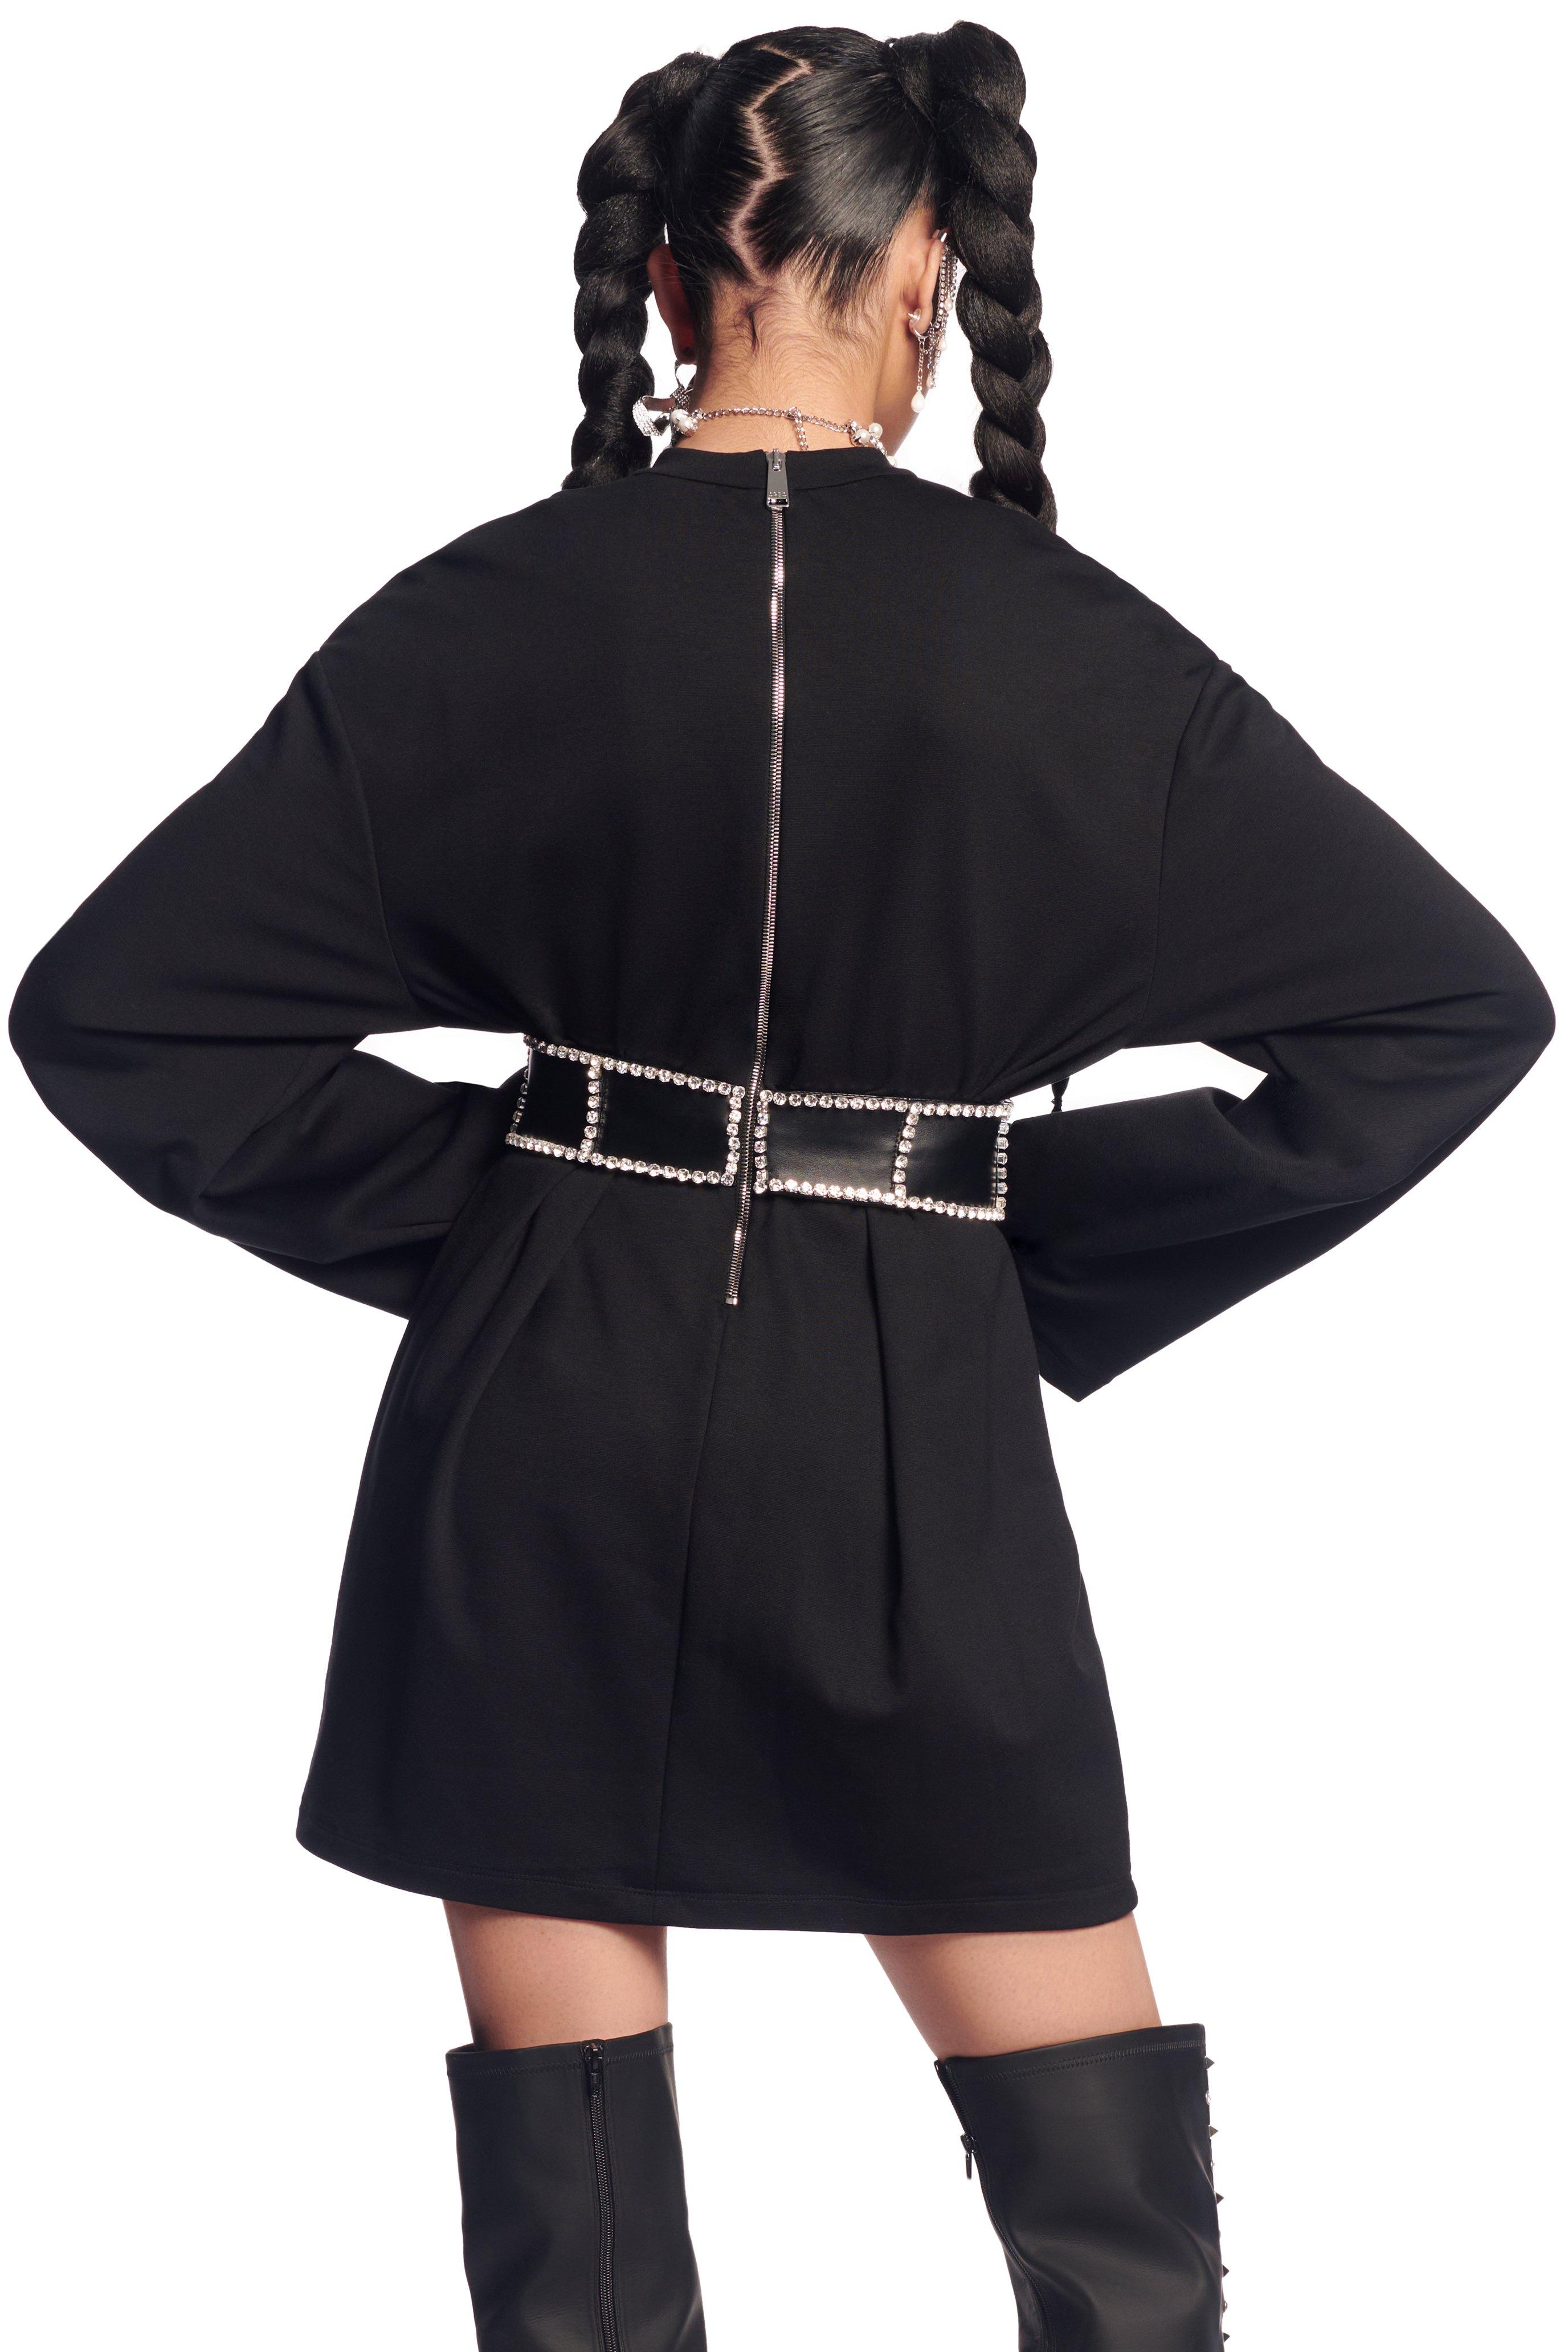 Long Sleeve Crystal Corseted T-shirt Dress